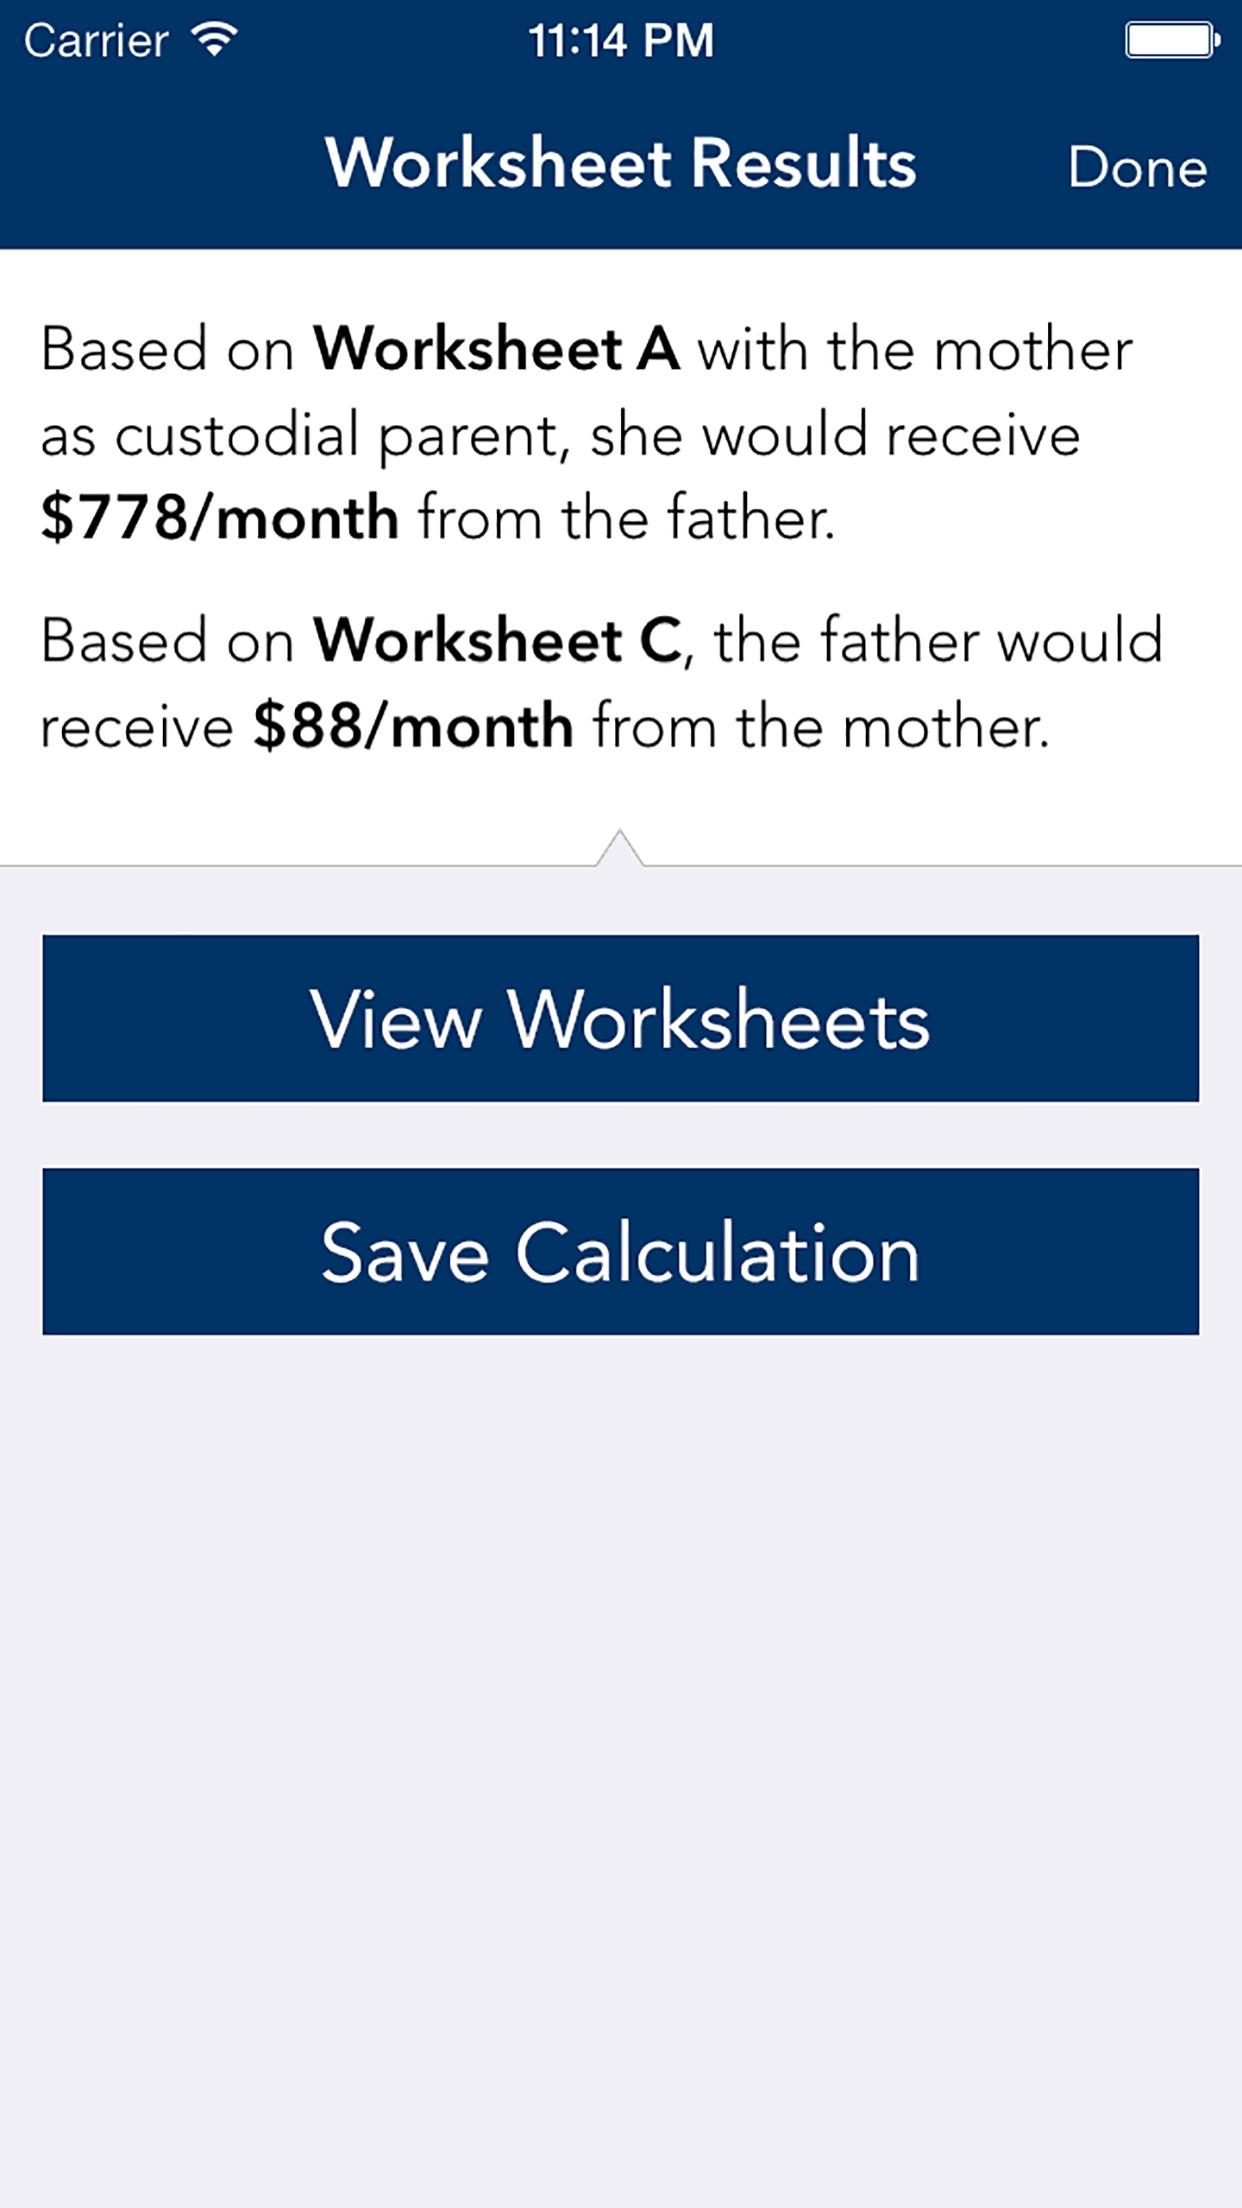 North Carolina Child Support Worksheet B justsingit – North Carolina Child Support Worksheet